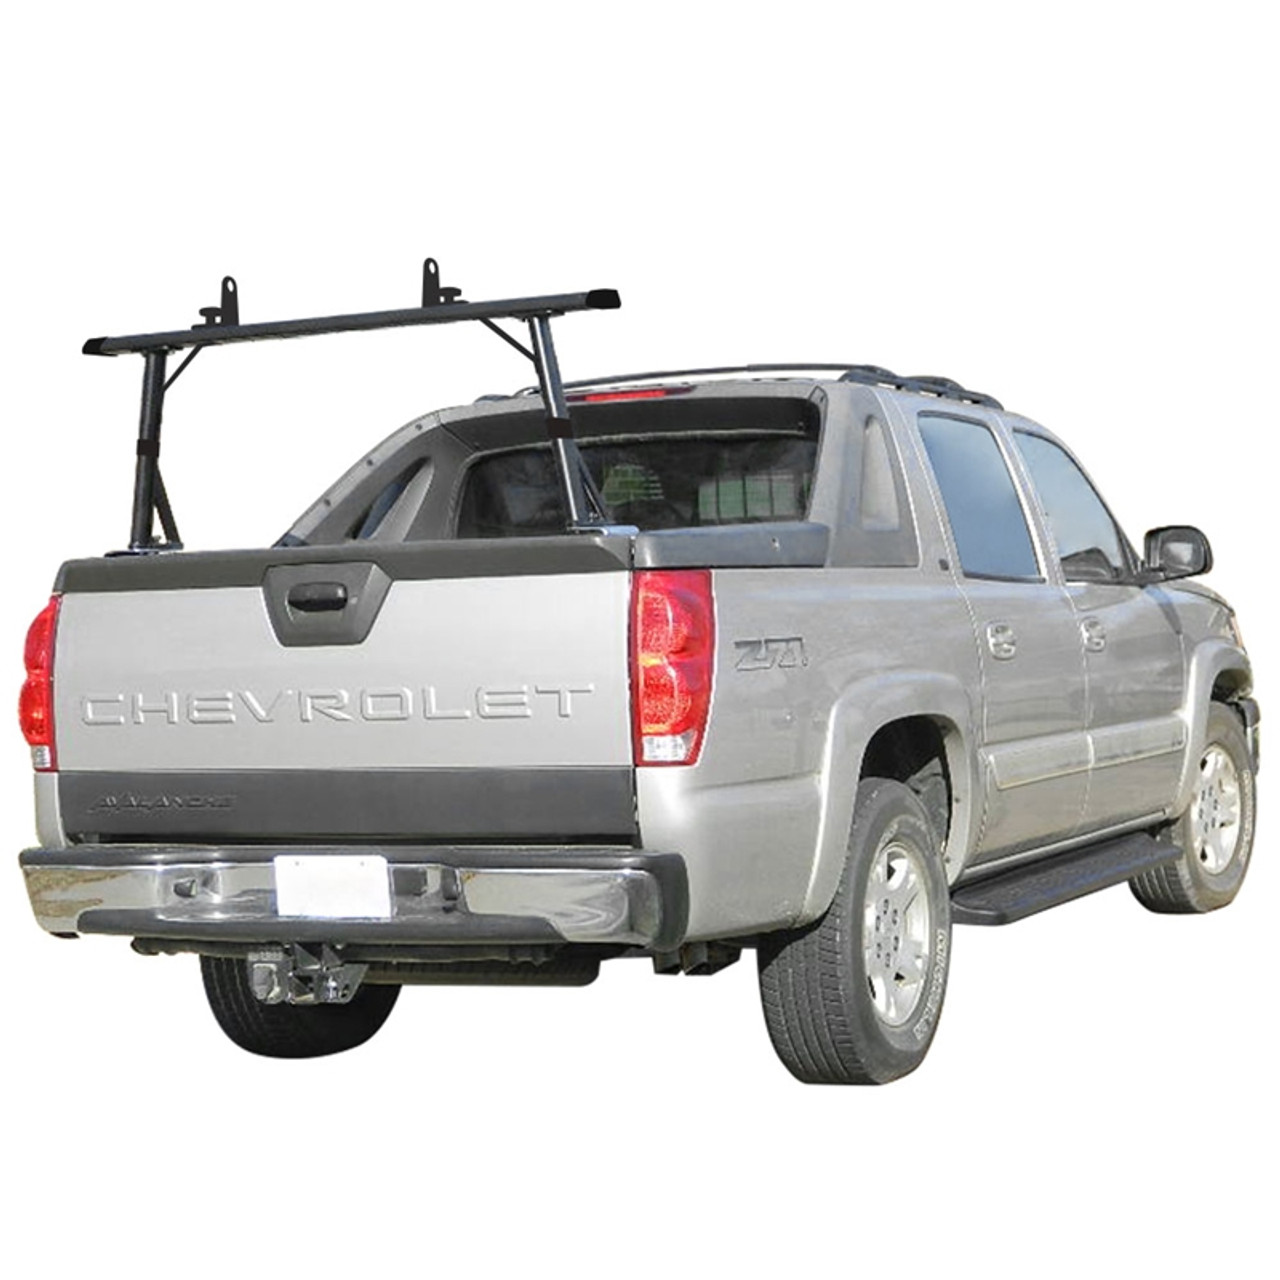 https leonardaccessories com product ladder racks vantech p3000 aluminum system for avalanche ridgeline rambox